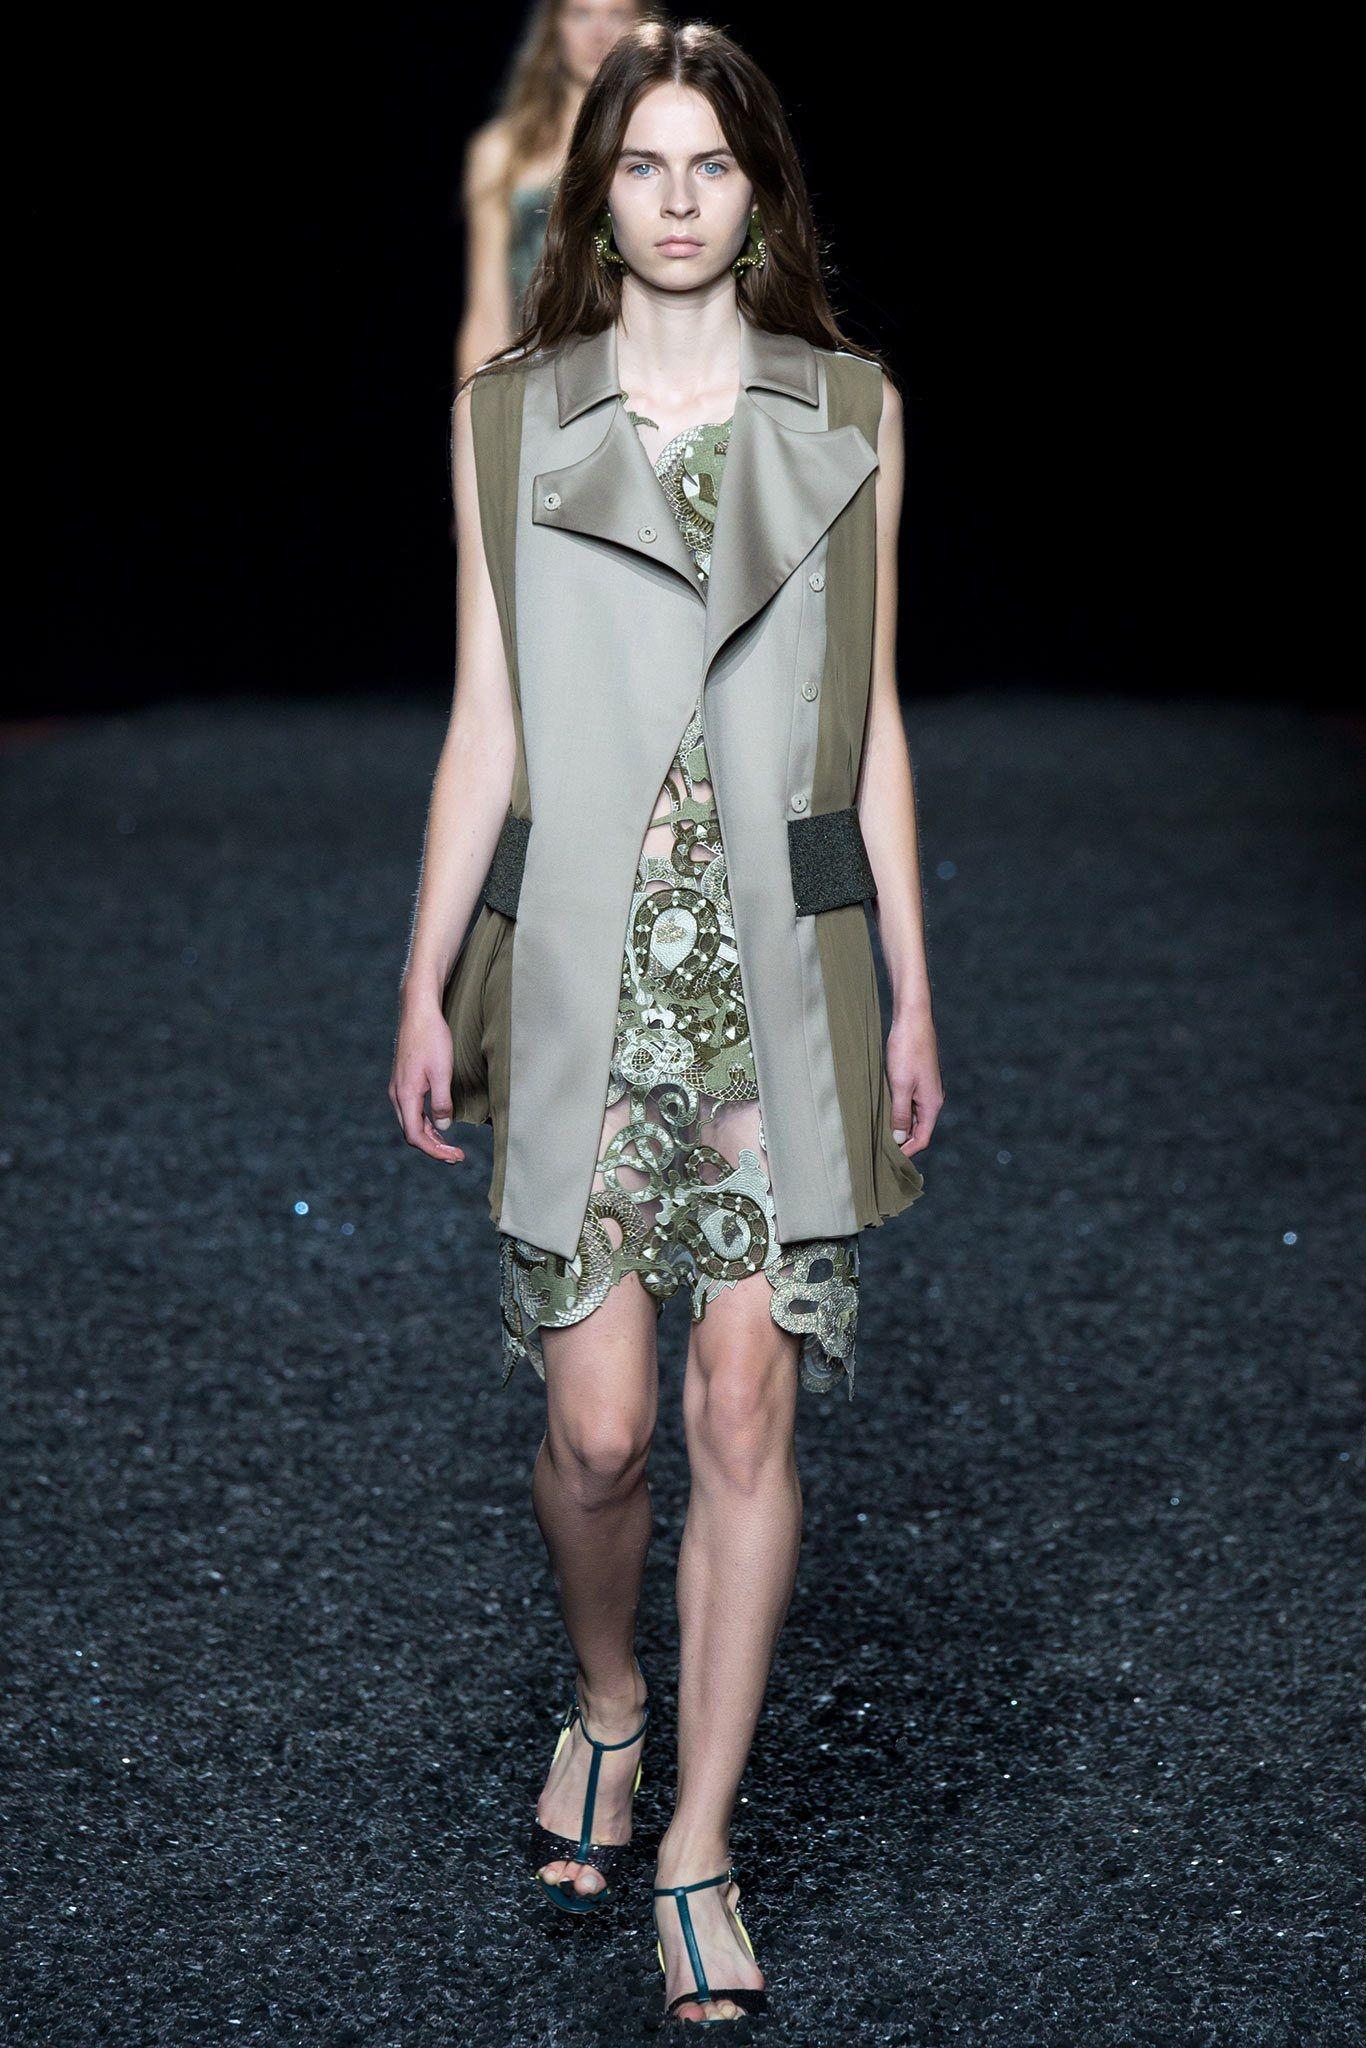 Mary Katrantzou Spring 2015 Ready-to-Wear Fashion Show - Willy Morsch